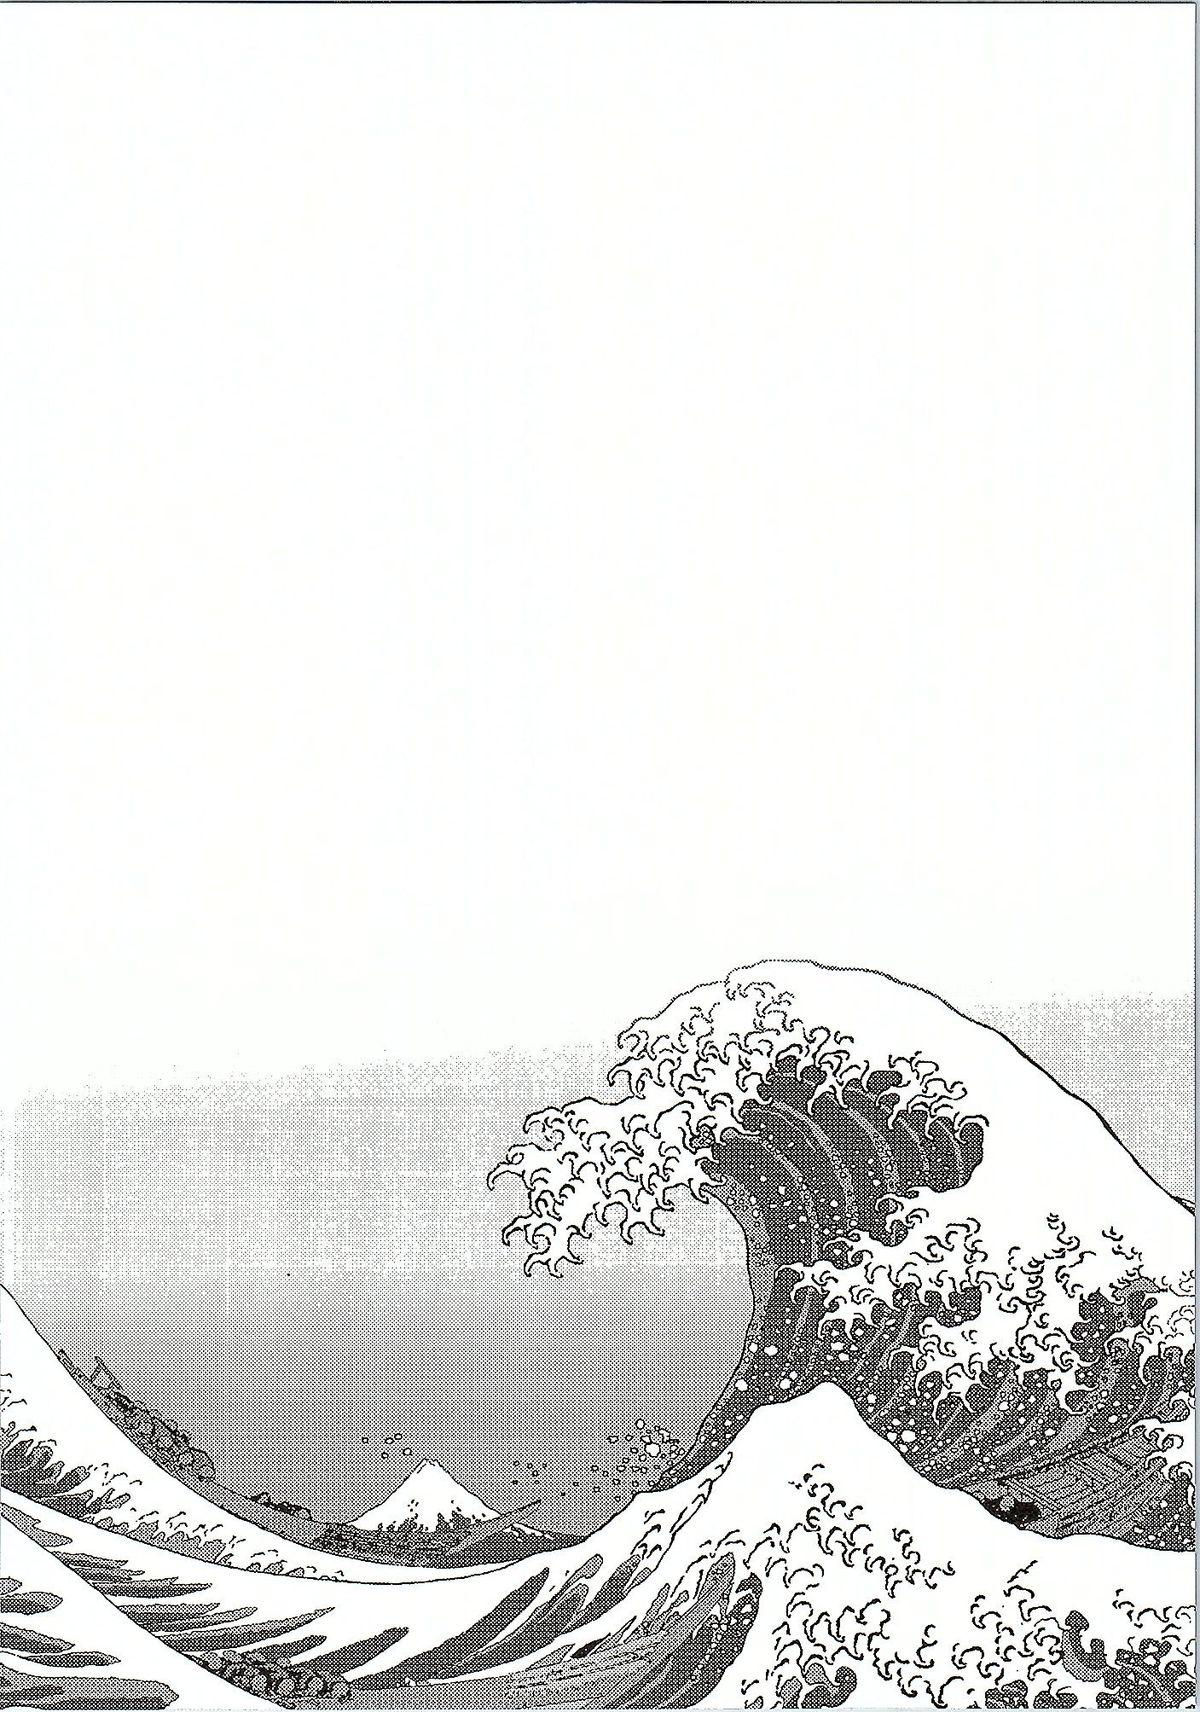 (C87) [Kaname (Siina Yuuki)] Totsugiko!!! Mikishiro-chan Ikazuchi-chan (Oshiro Project ~CASTLE DEFENSE~, Kantai Collection -KanColle-) 8